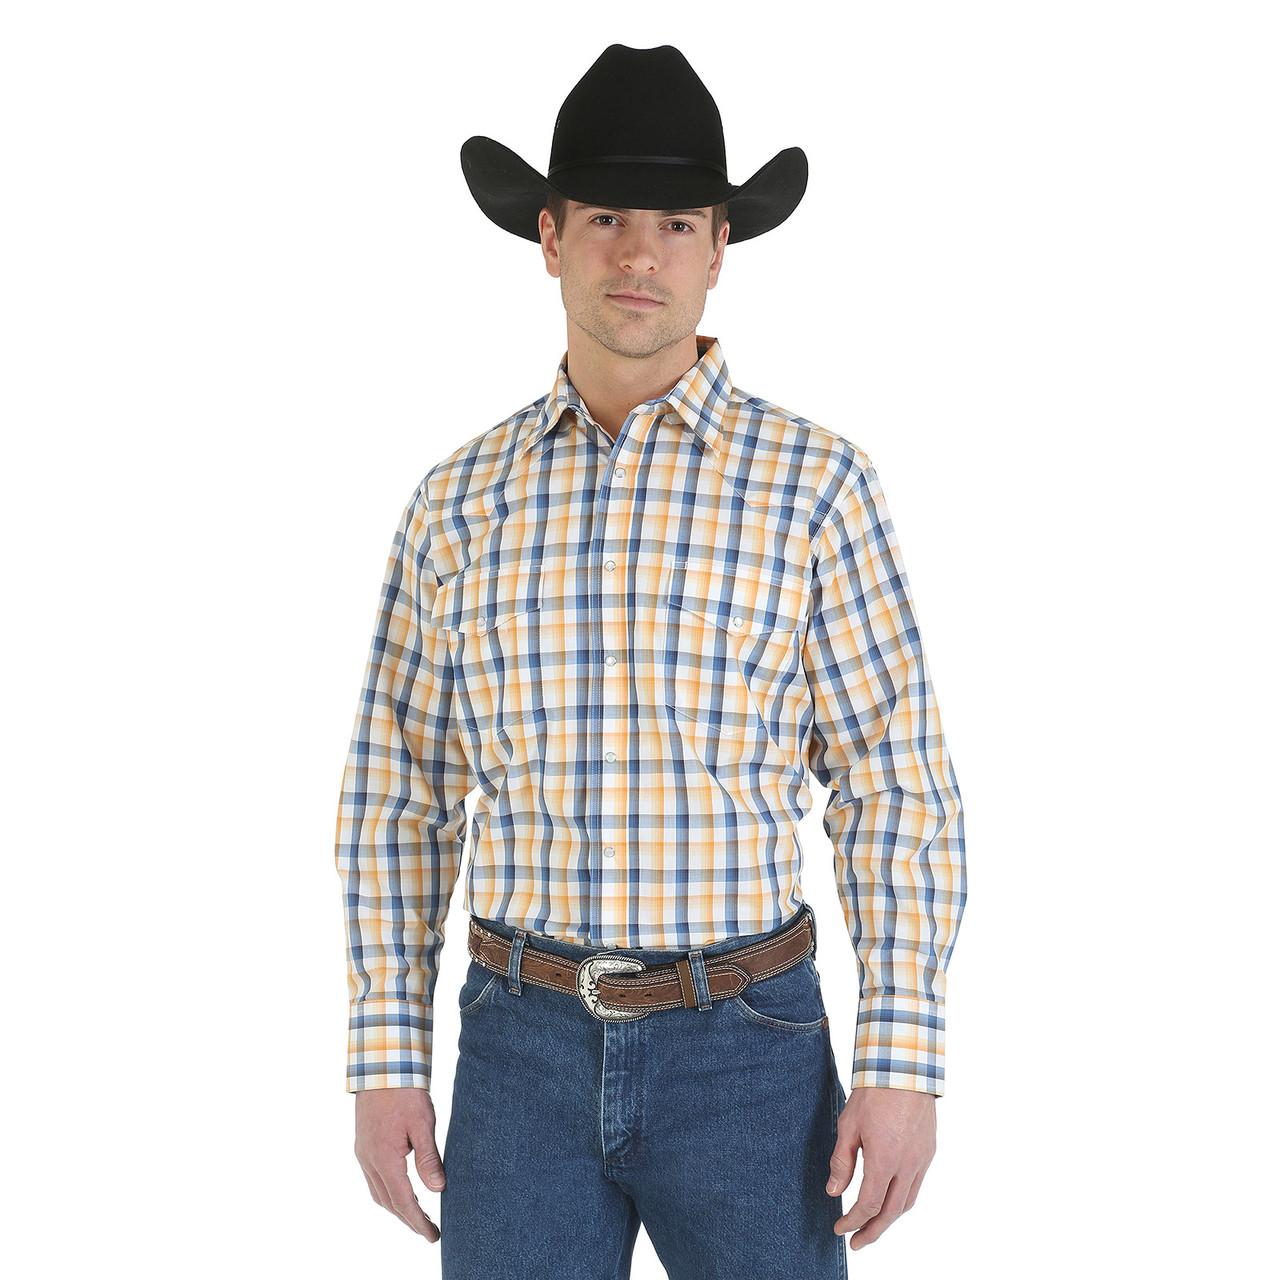 Рубашка Wrangler Wrinkle Resist, S, White/Blue/Gold, MWR174M